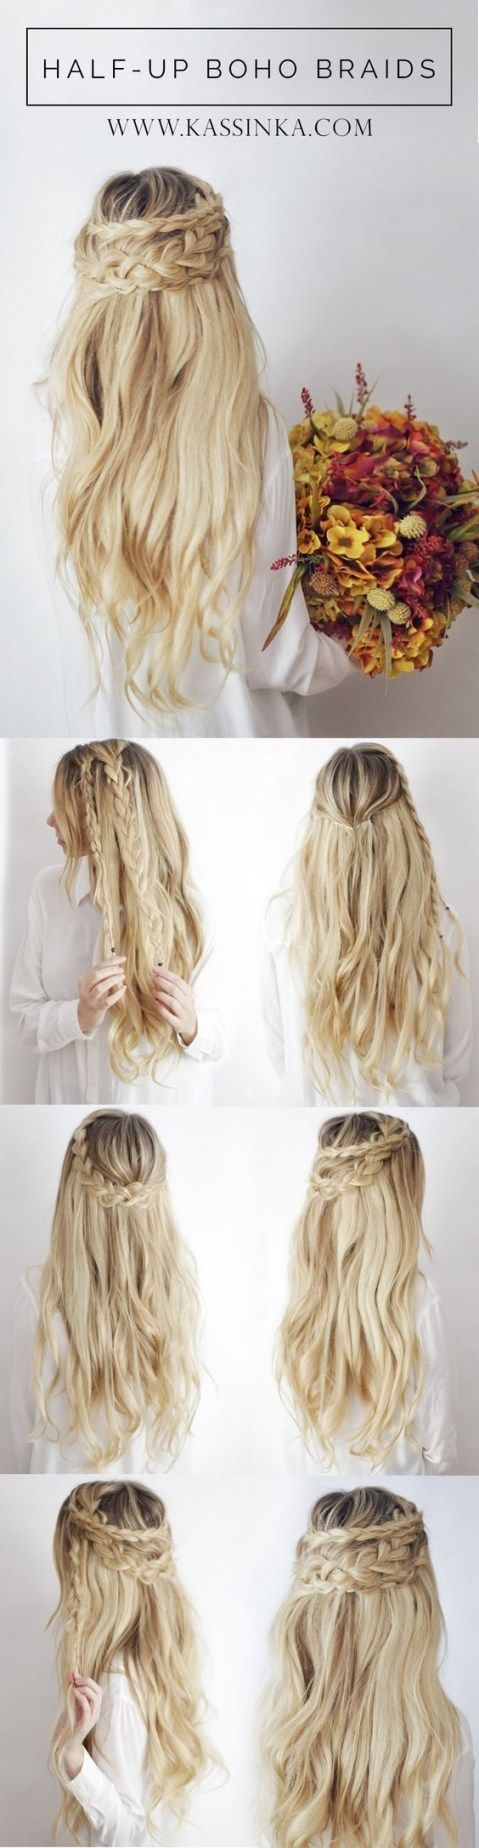 1628 best medium hair images on Pinterest   Hairstyle ideas, Cute ...